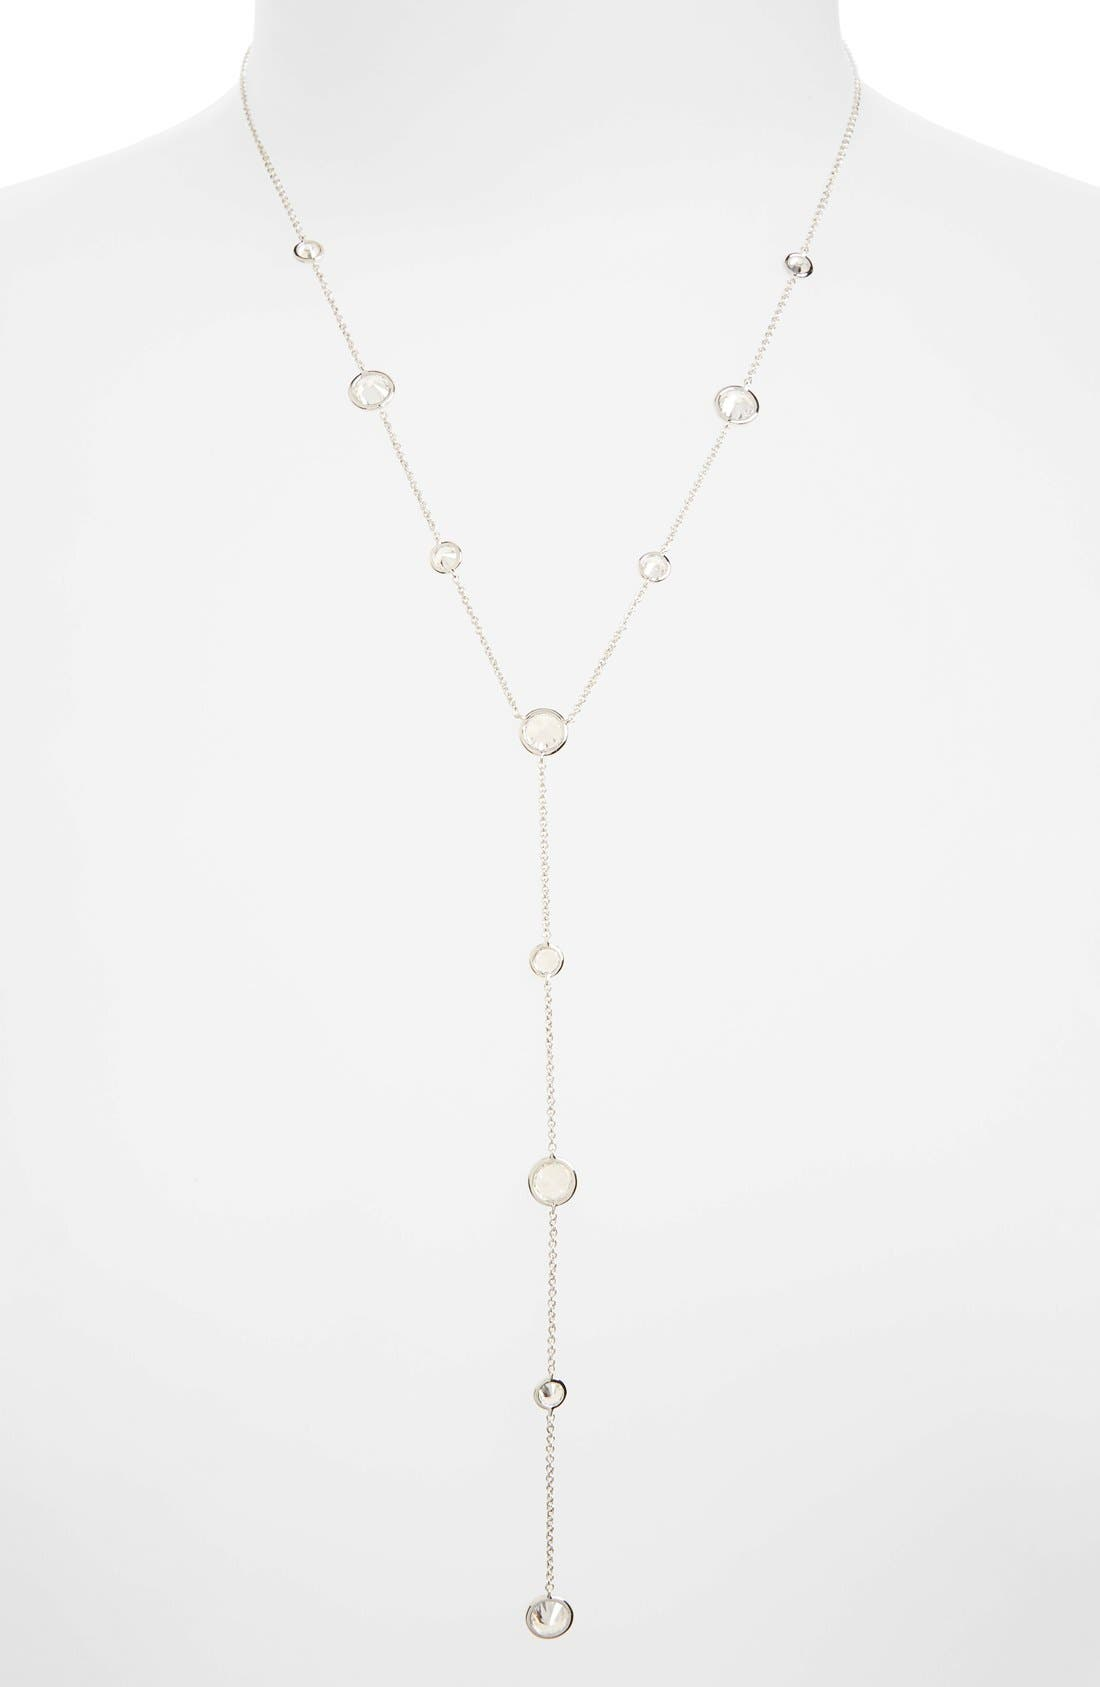 Cubic Zirconia Bezel Y-Necklace,                             Main thumbnail 1, color,                             SILVER